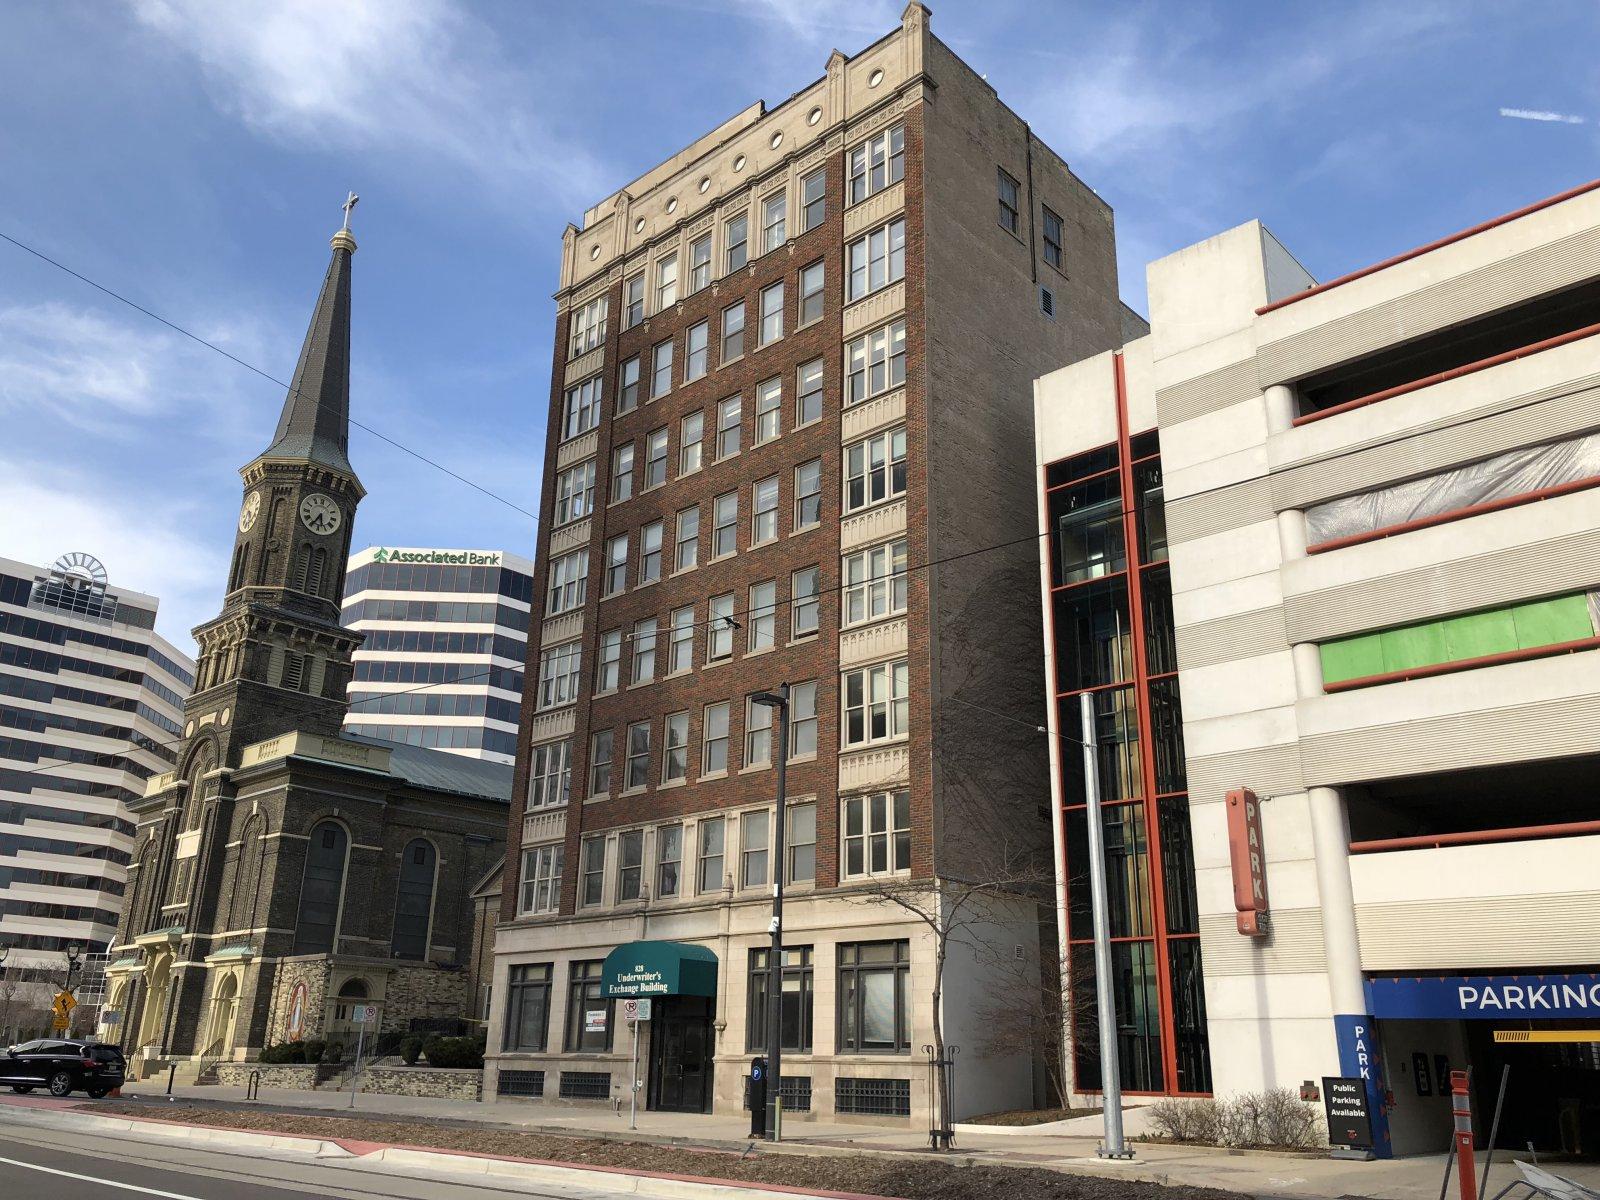 Underwriters Exchange Building